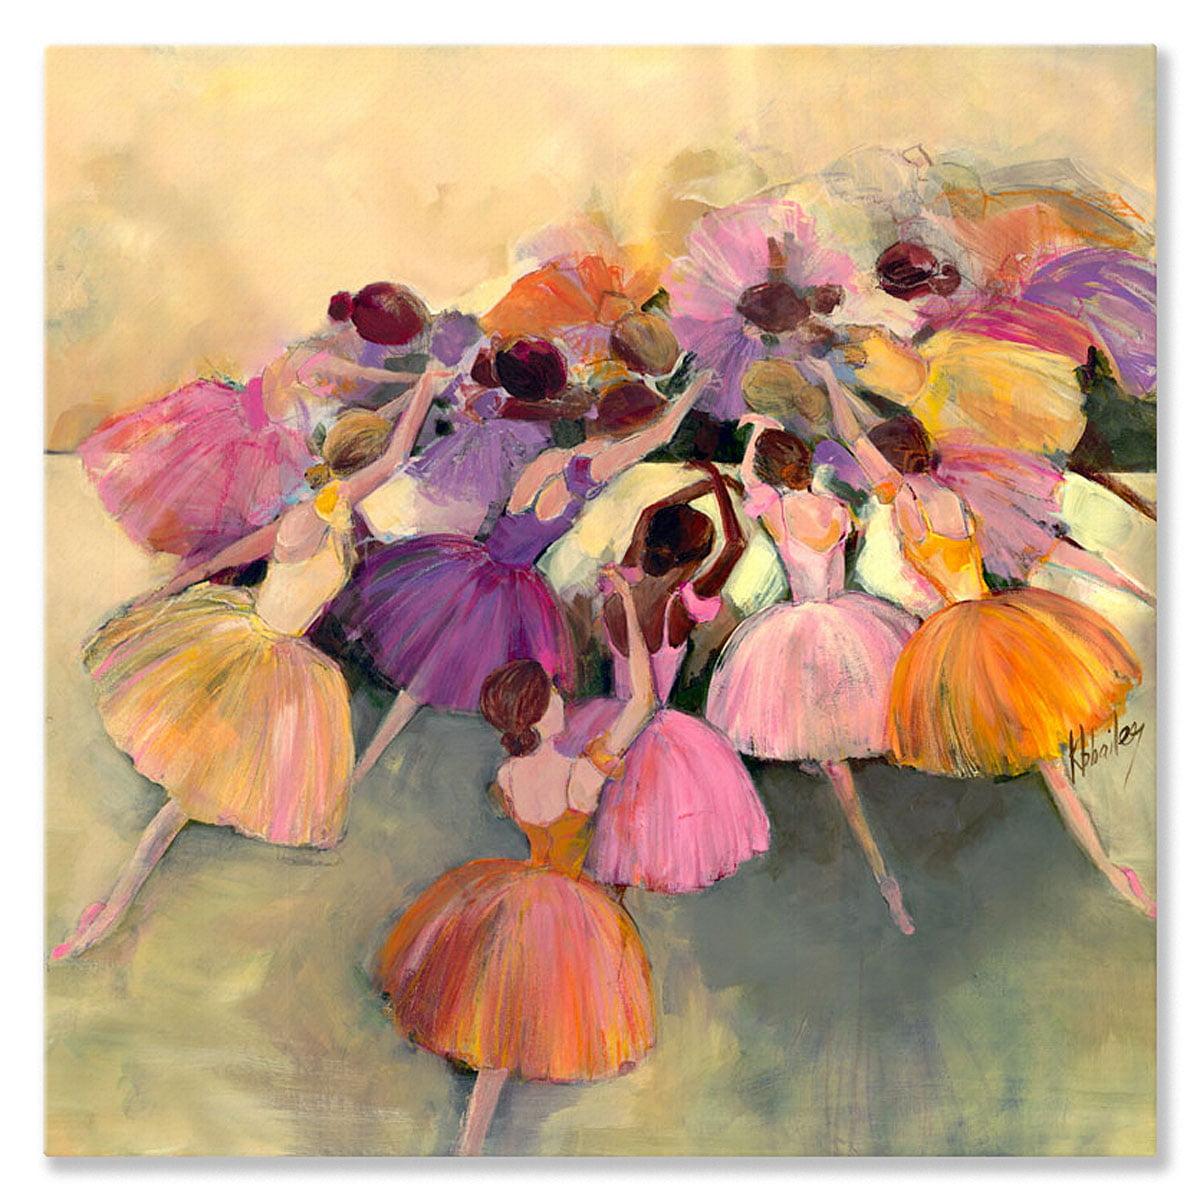 Oopsy Daisy - Canvas Wall Art Ballerina Ensemble 39x39 By Kristina Bass Bailey